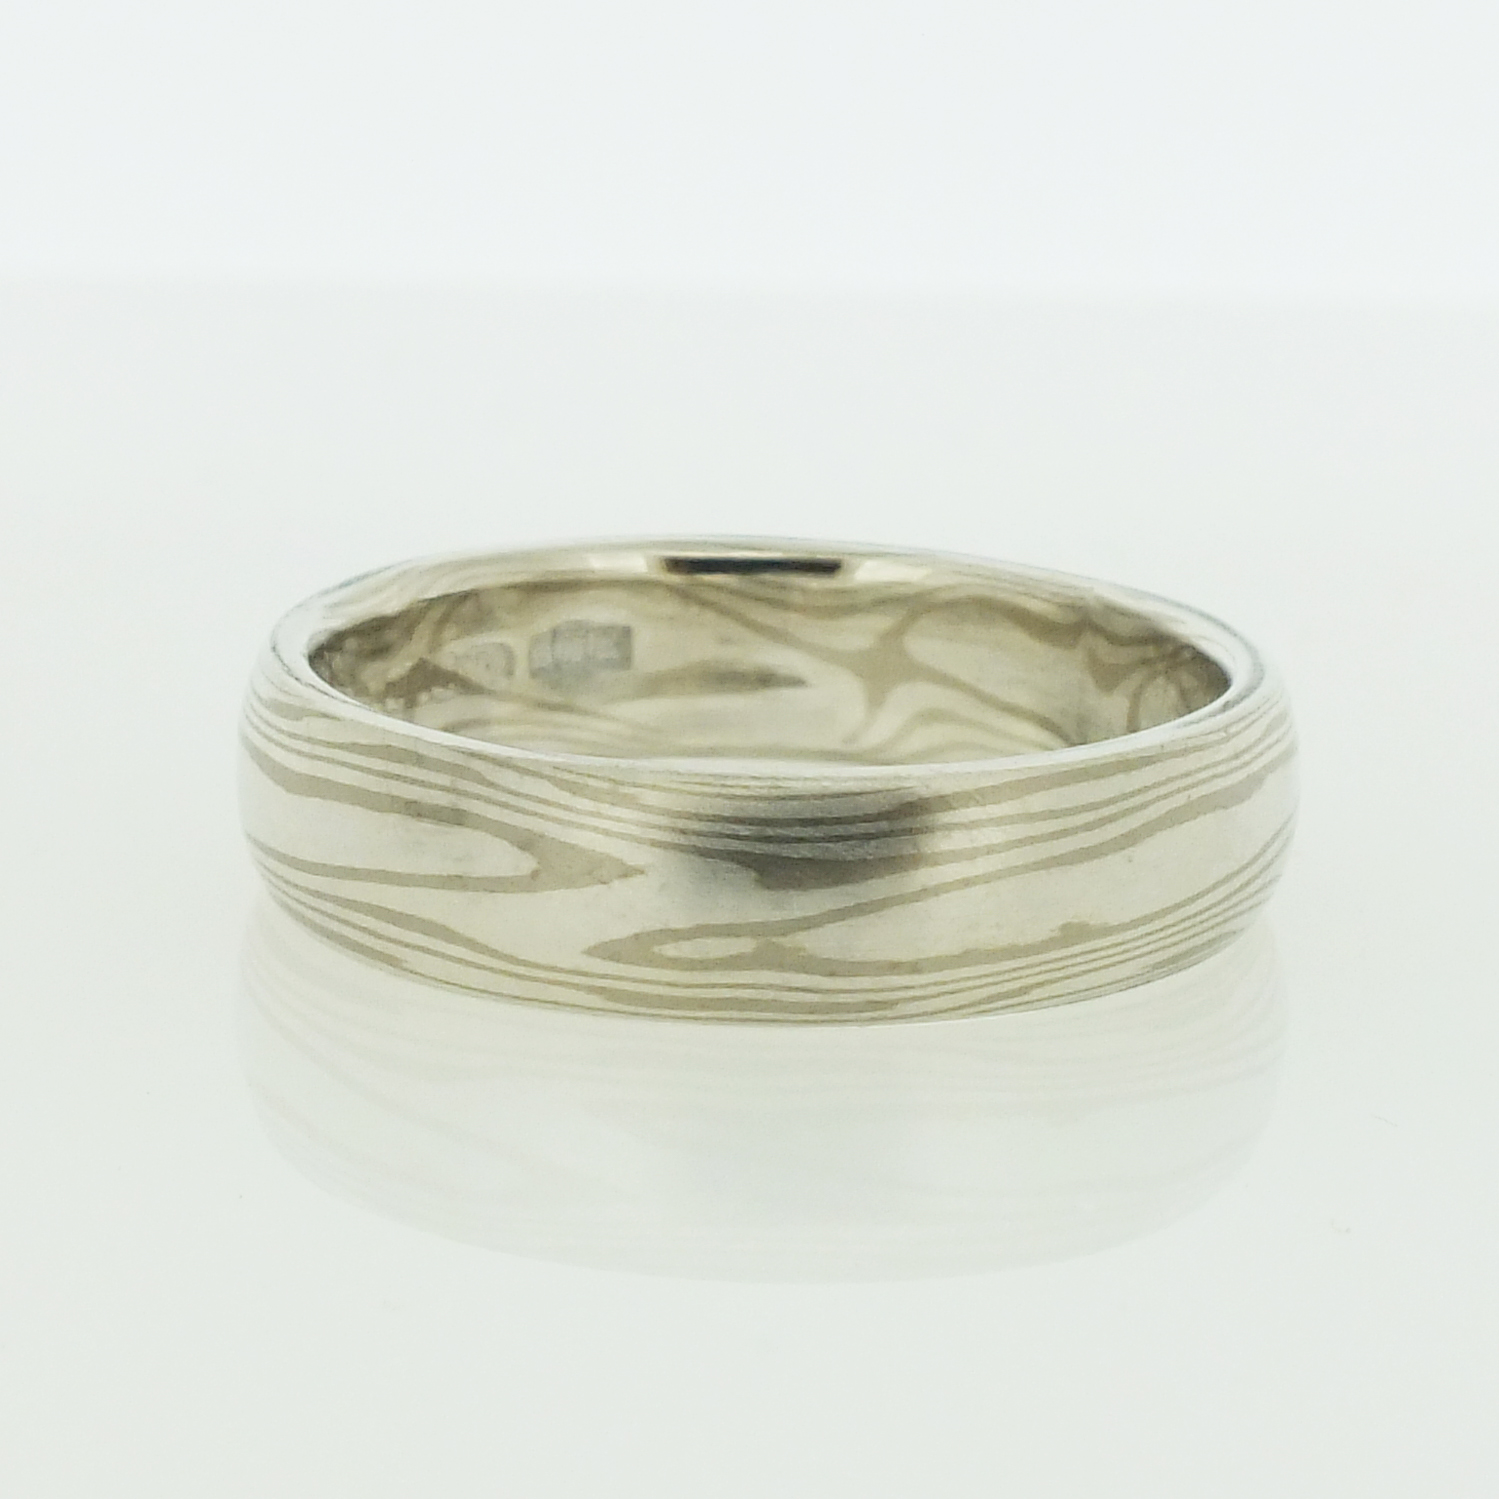 18k White Gold And Silver Mokume Gane Rings